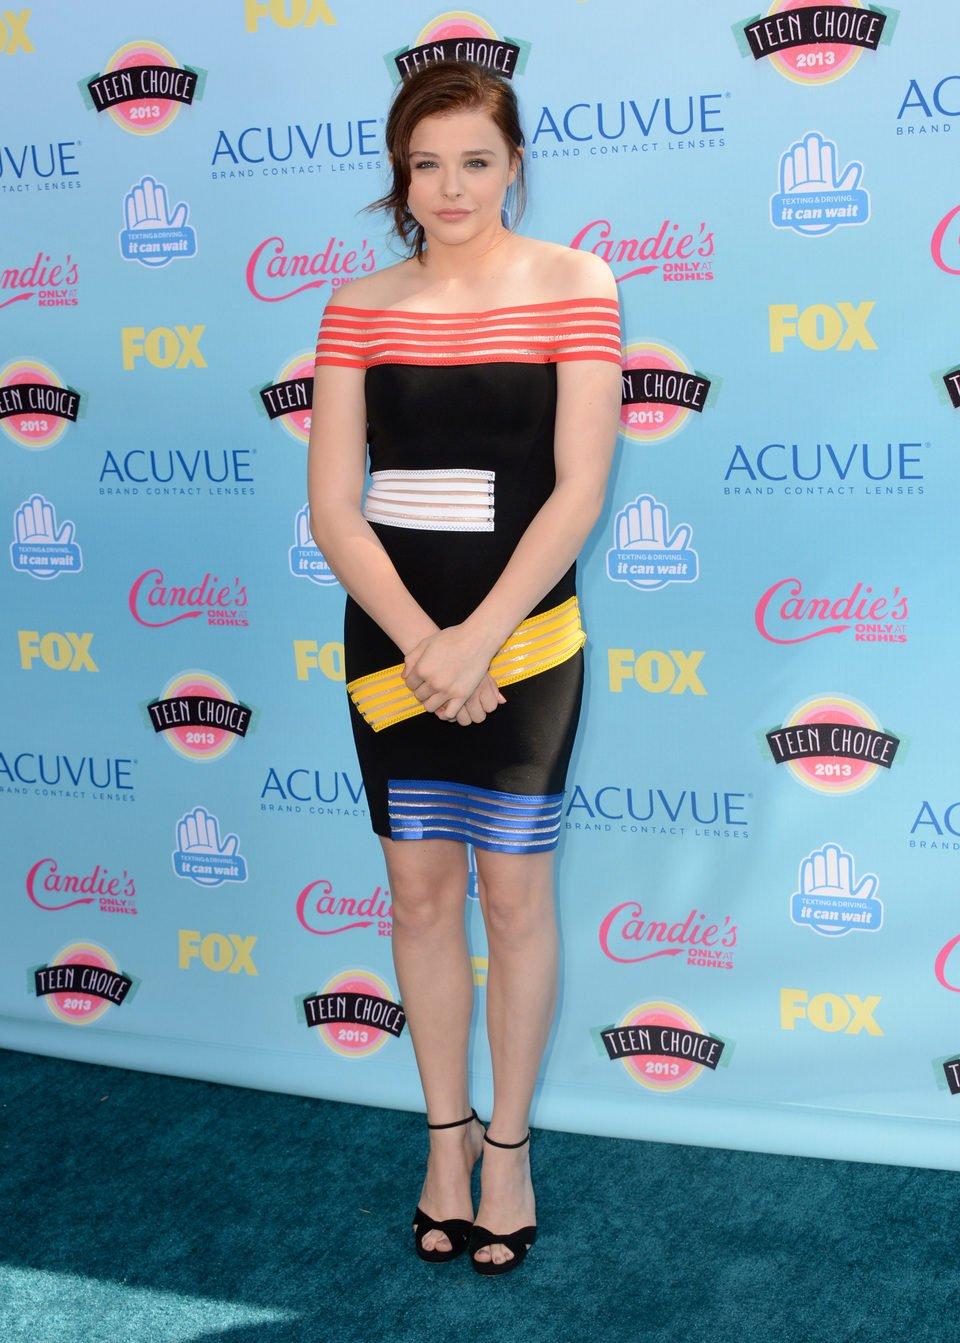 Chloë Grace Moretz en los Teen Choice Awards 2013